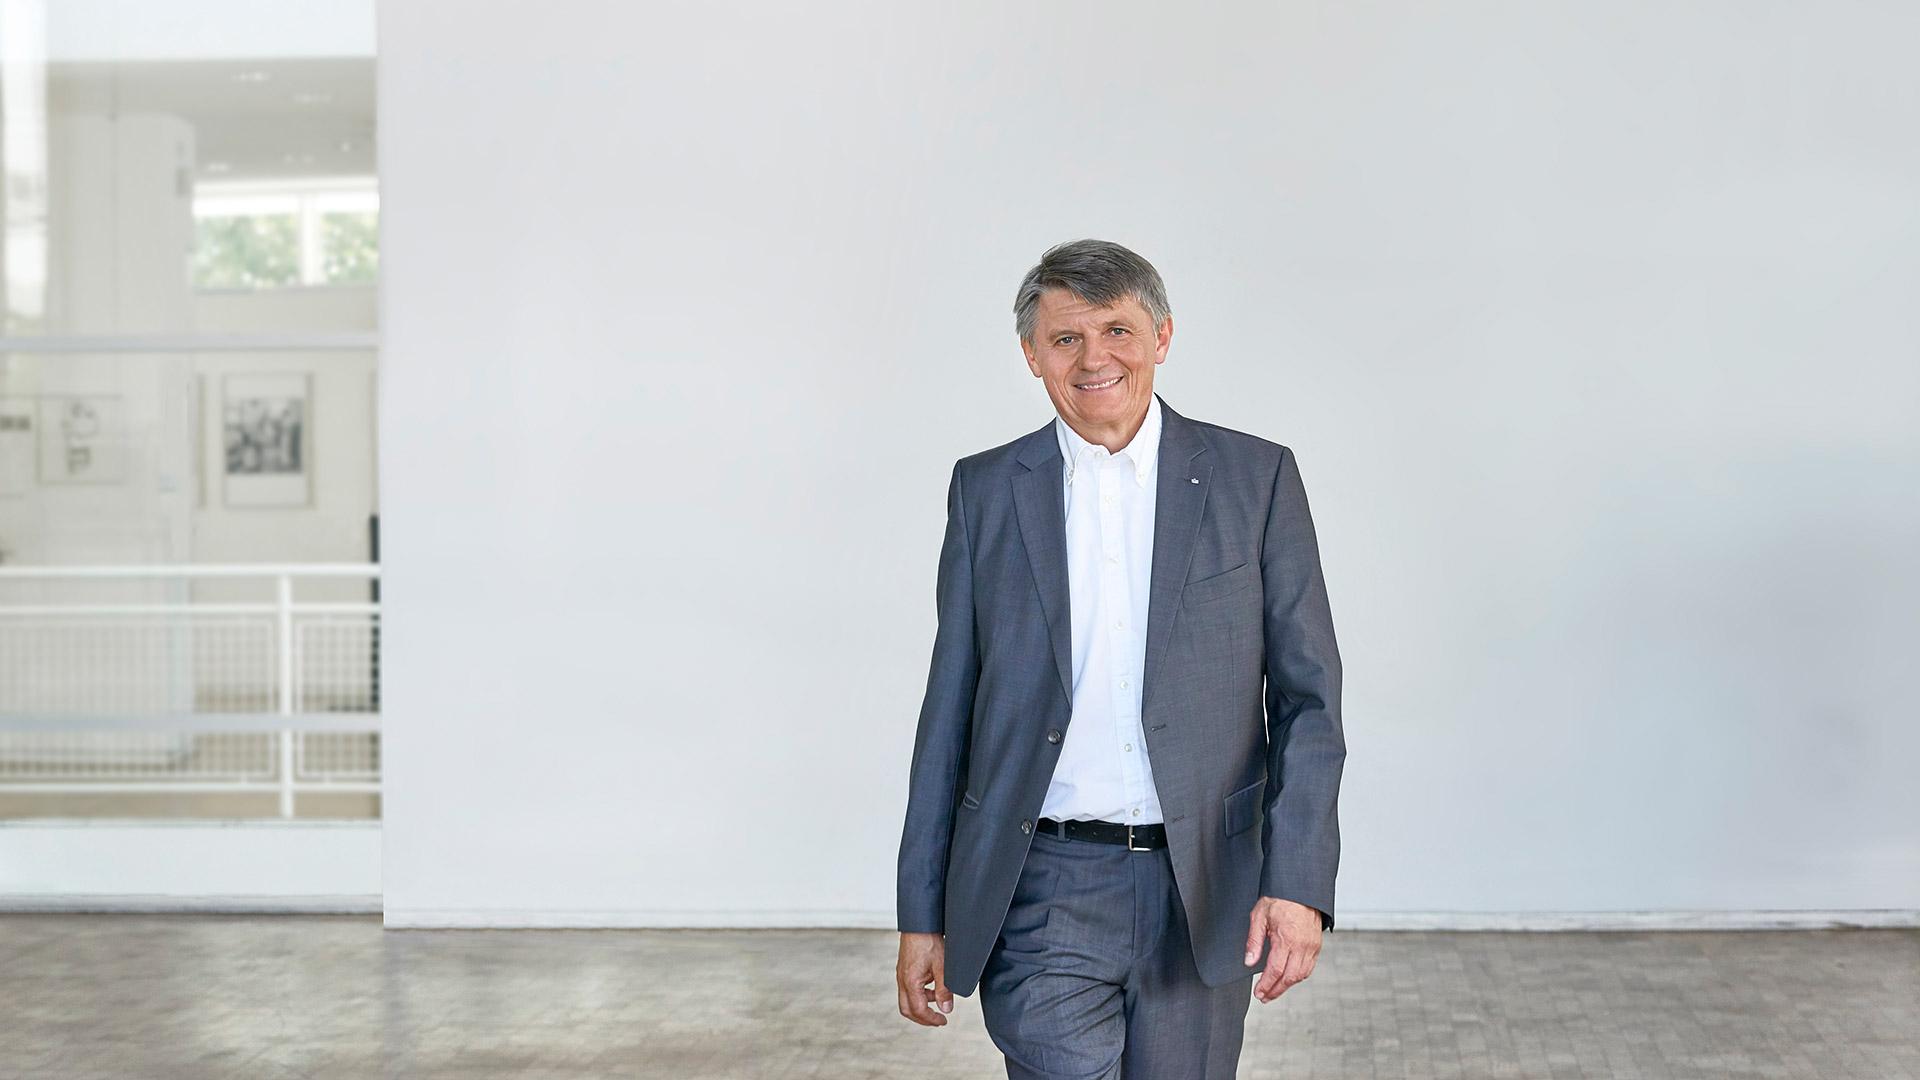 Martin Rivoir –Landtagsabgeordneter SPD, Wahlkreis Ulm/Alb-Donau –Galerie